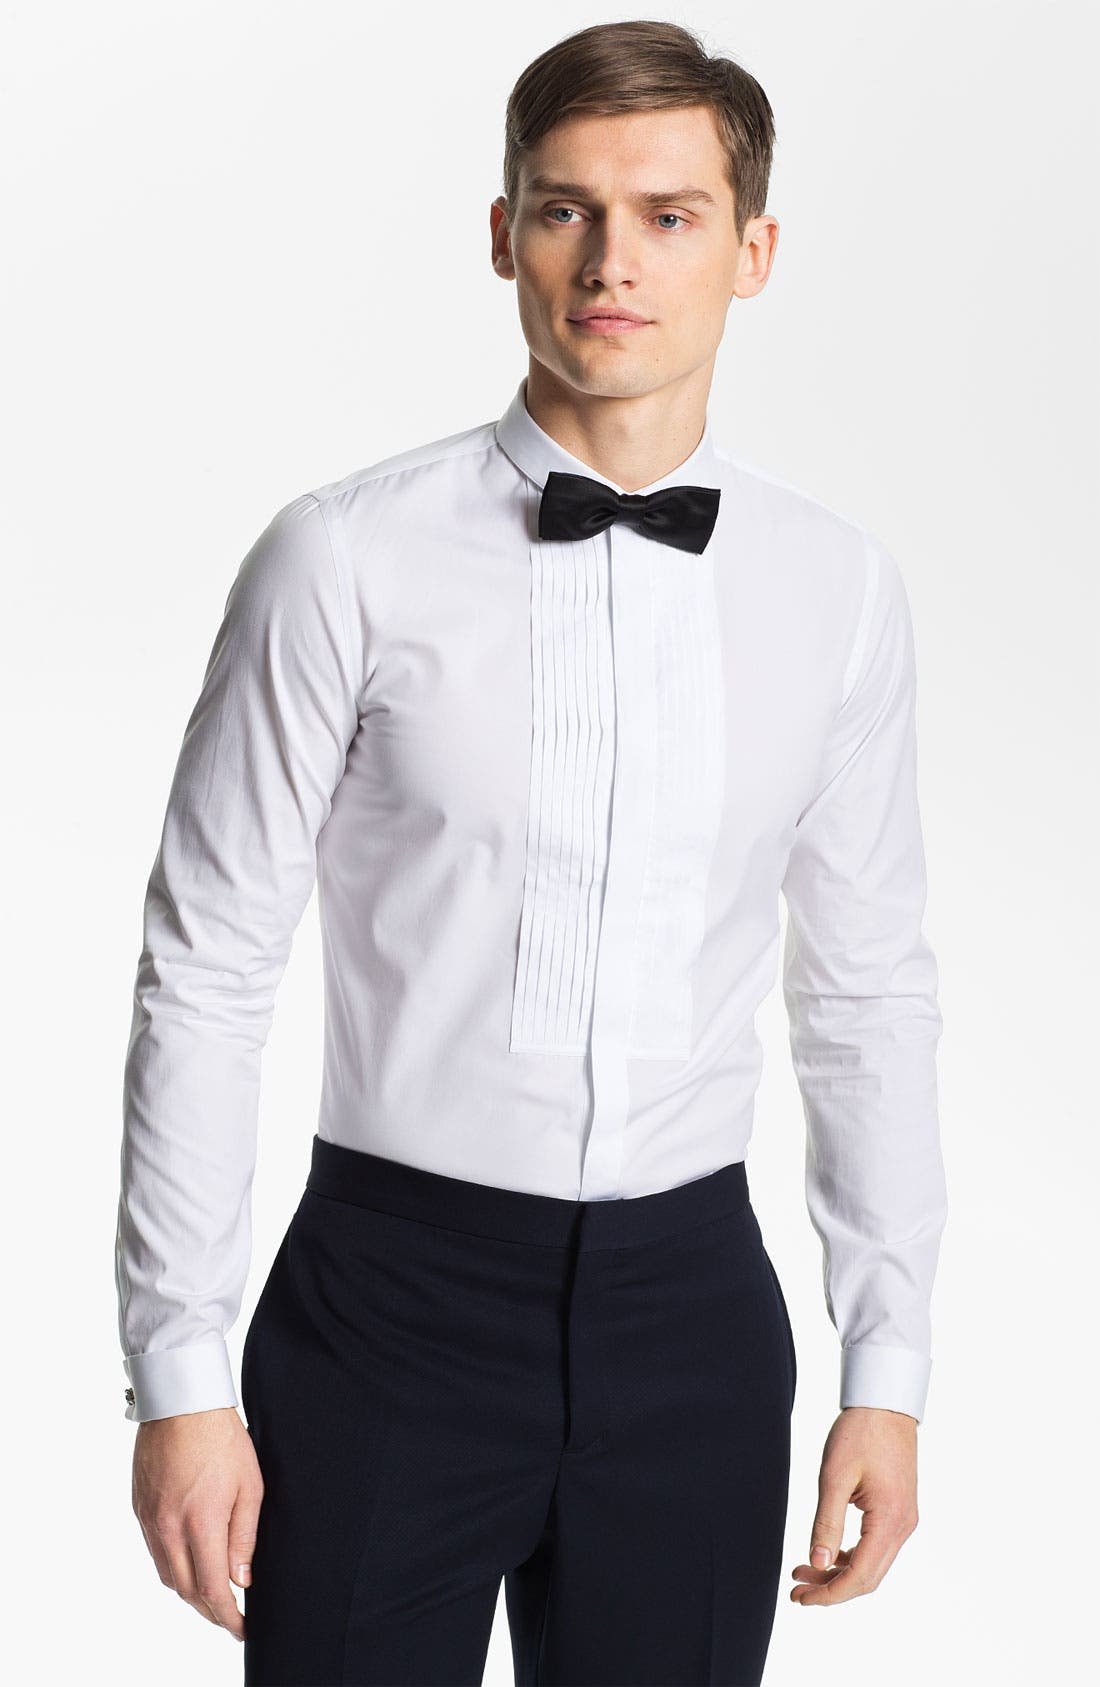 Alternate Image 1 Selected - Burberry Prorsum Cotton Poplin Tuxedo Shirt